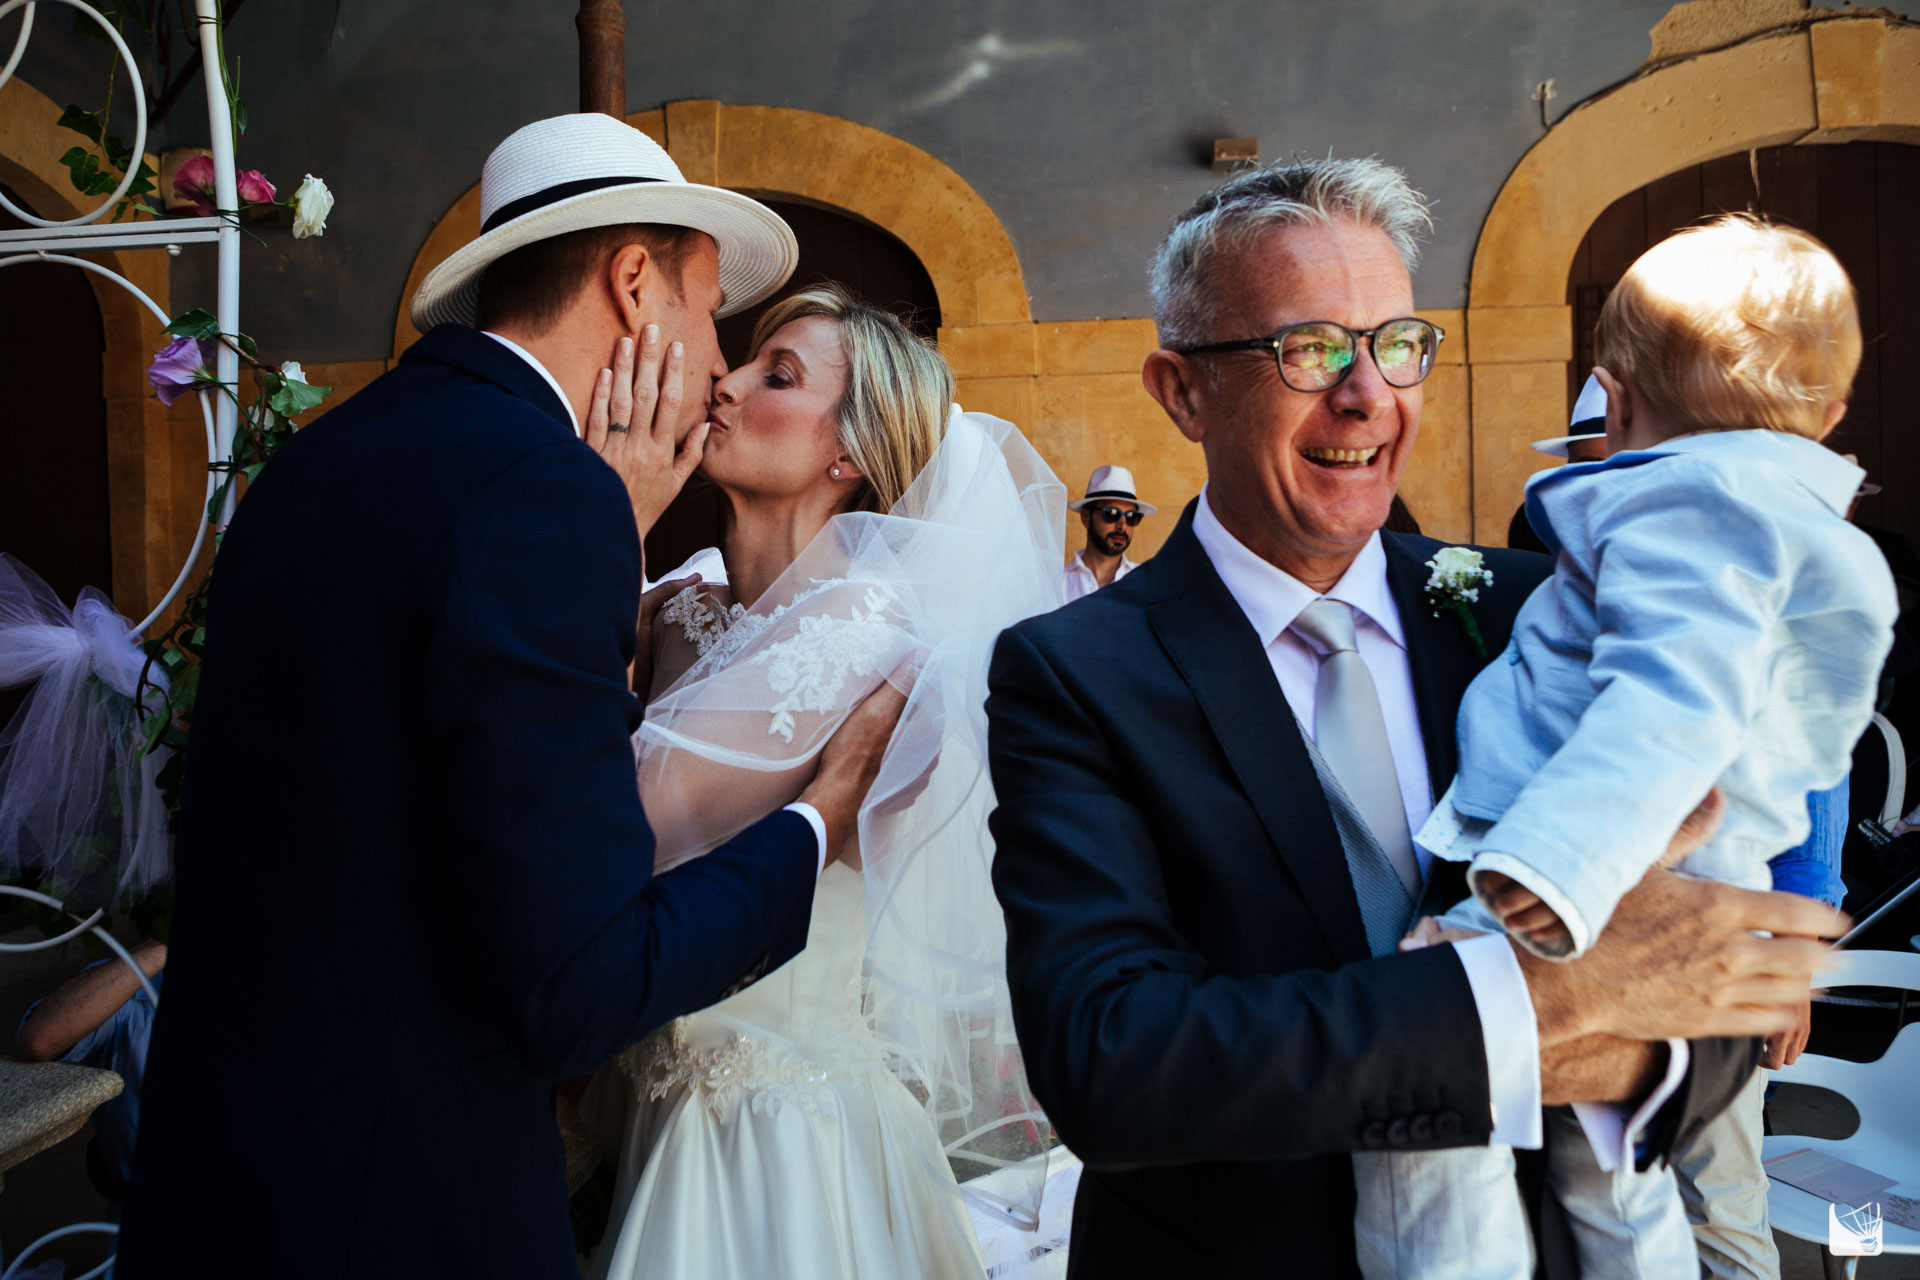 wedding_in_marzamemi-24.jpg